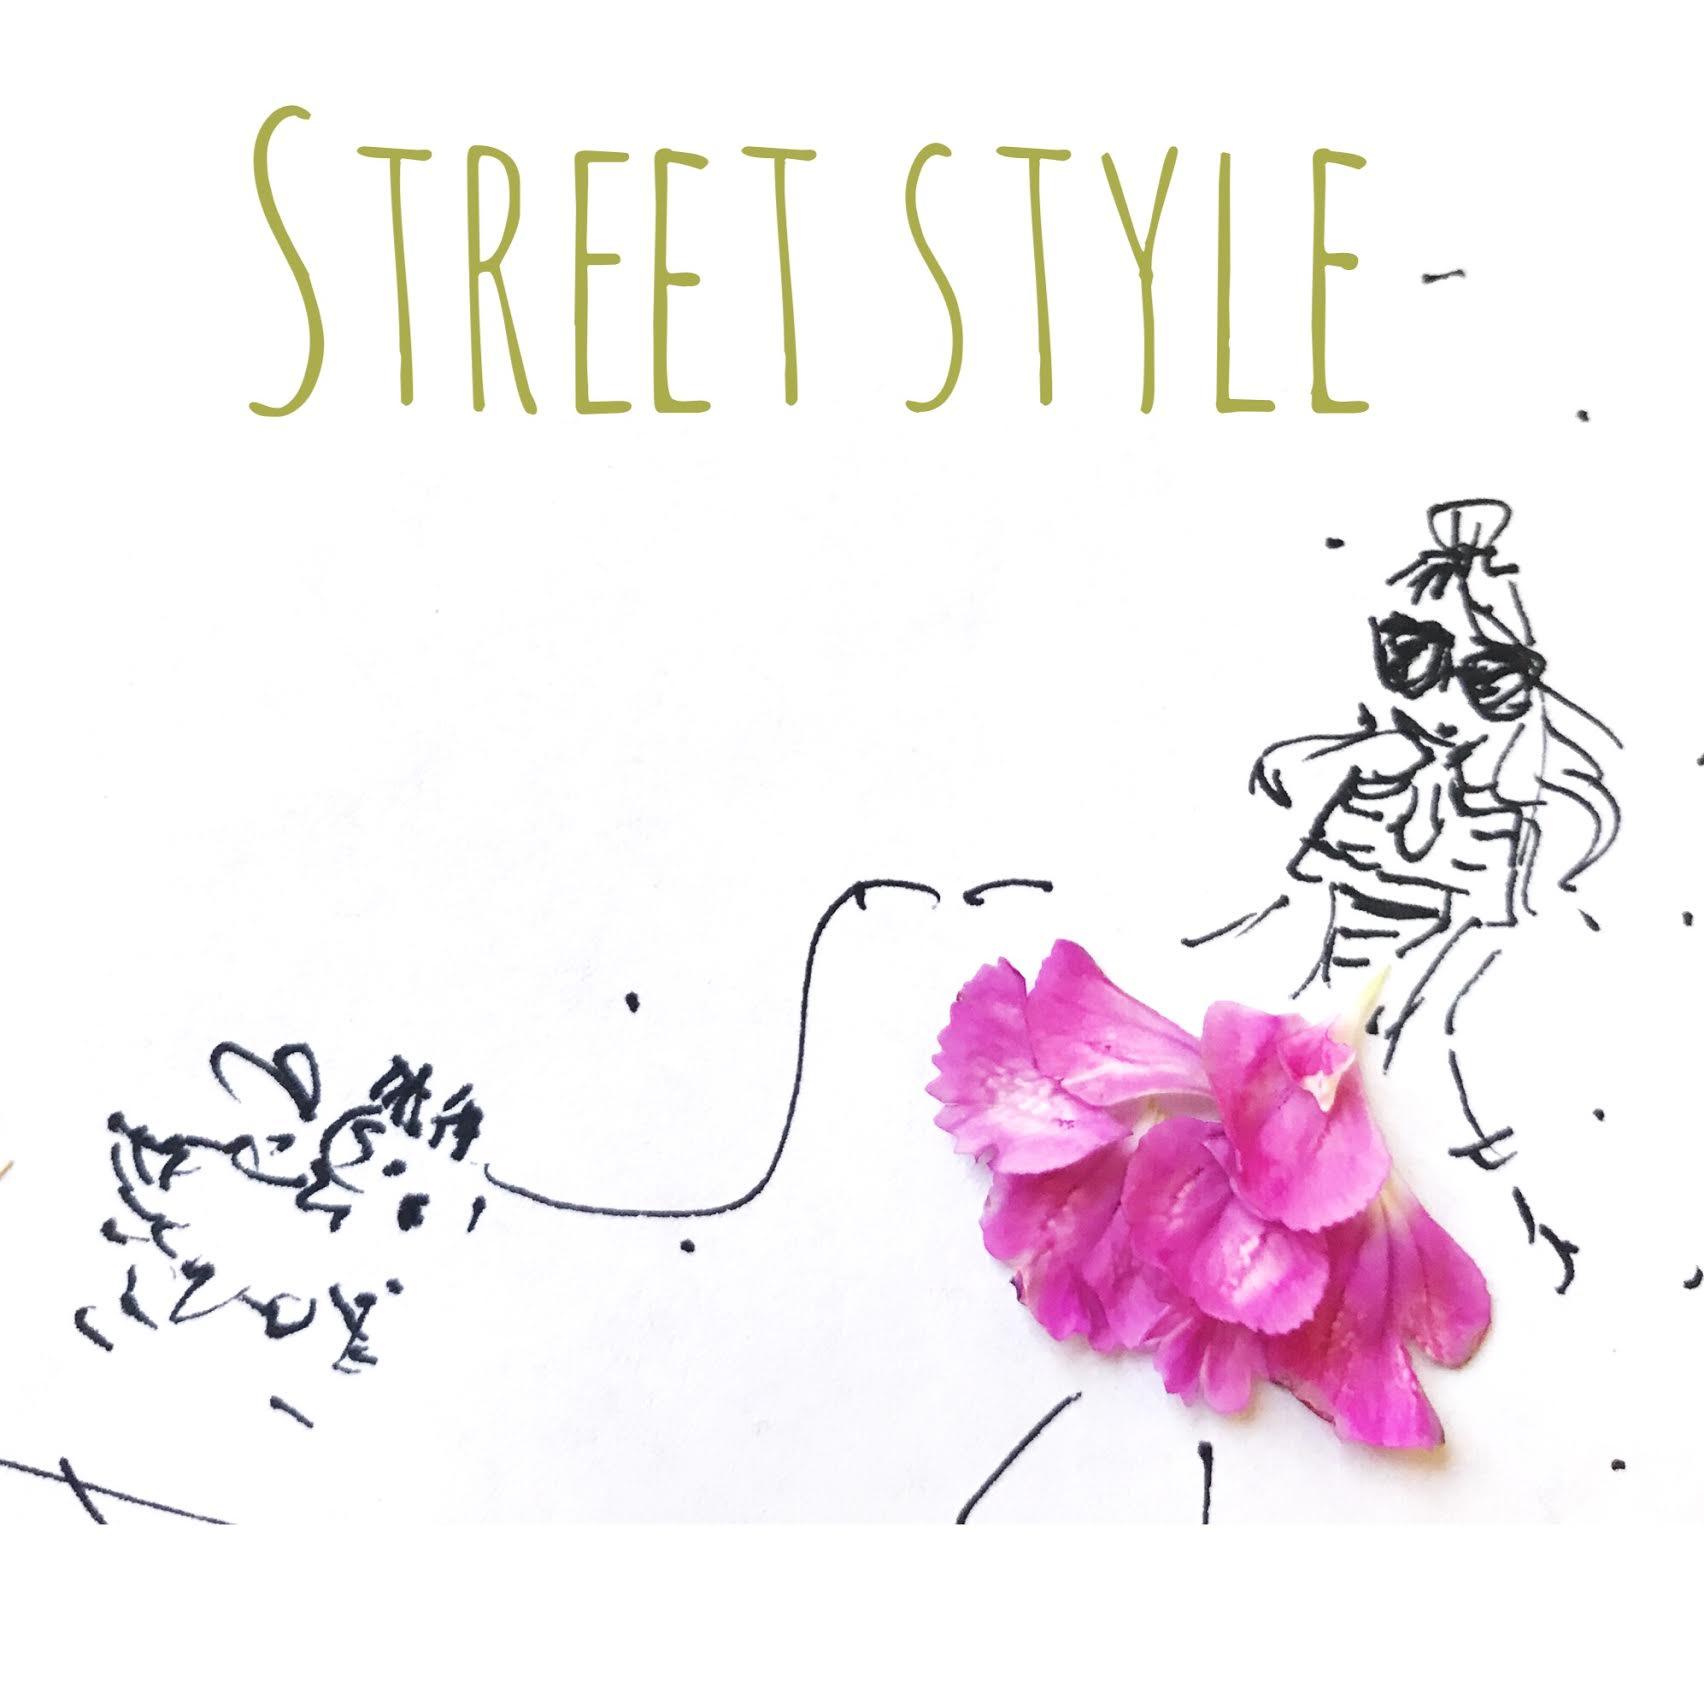 streetstyle-5.jpg